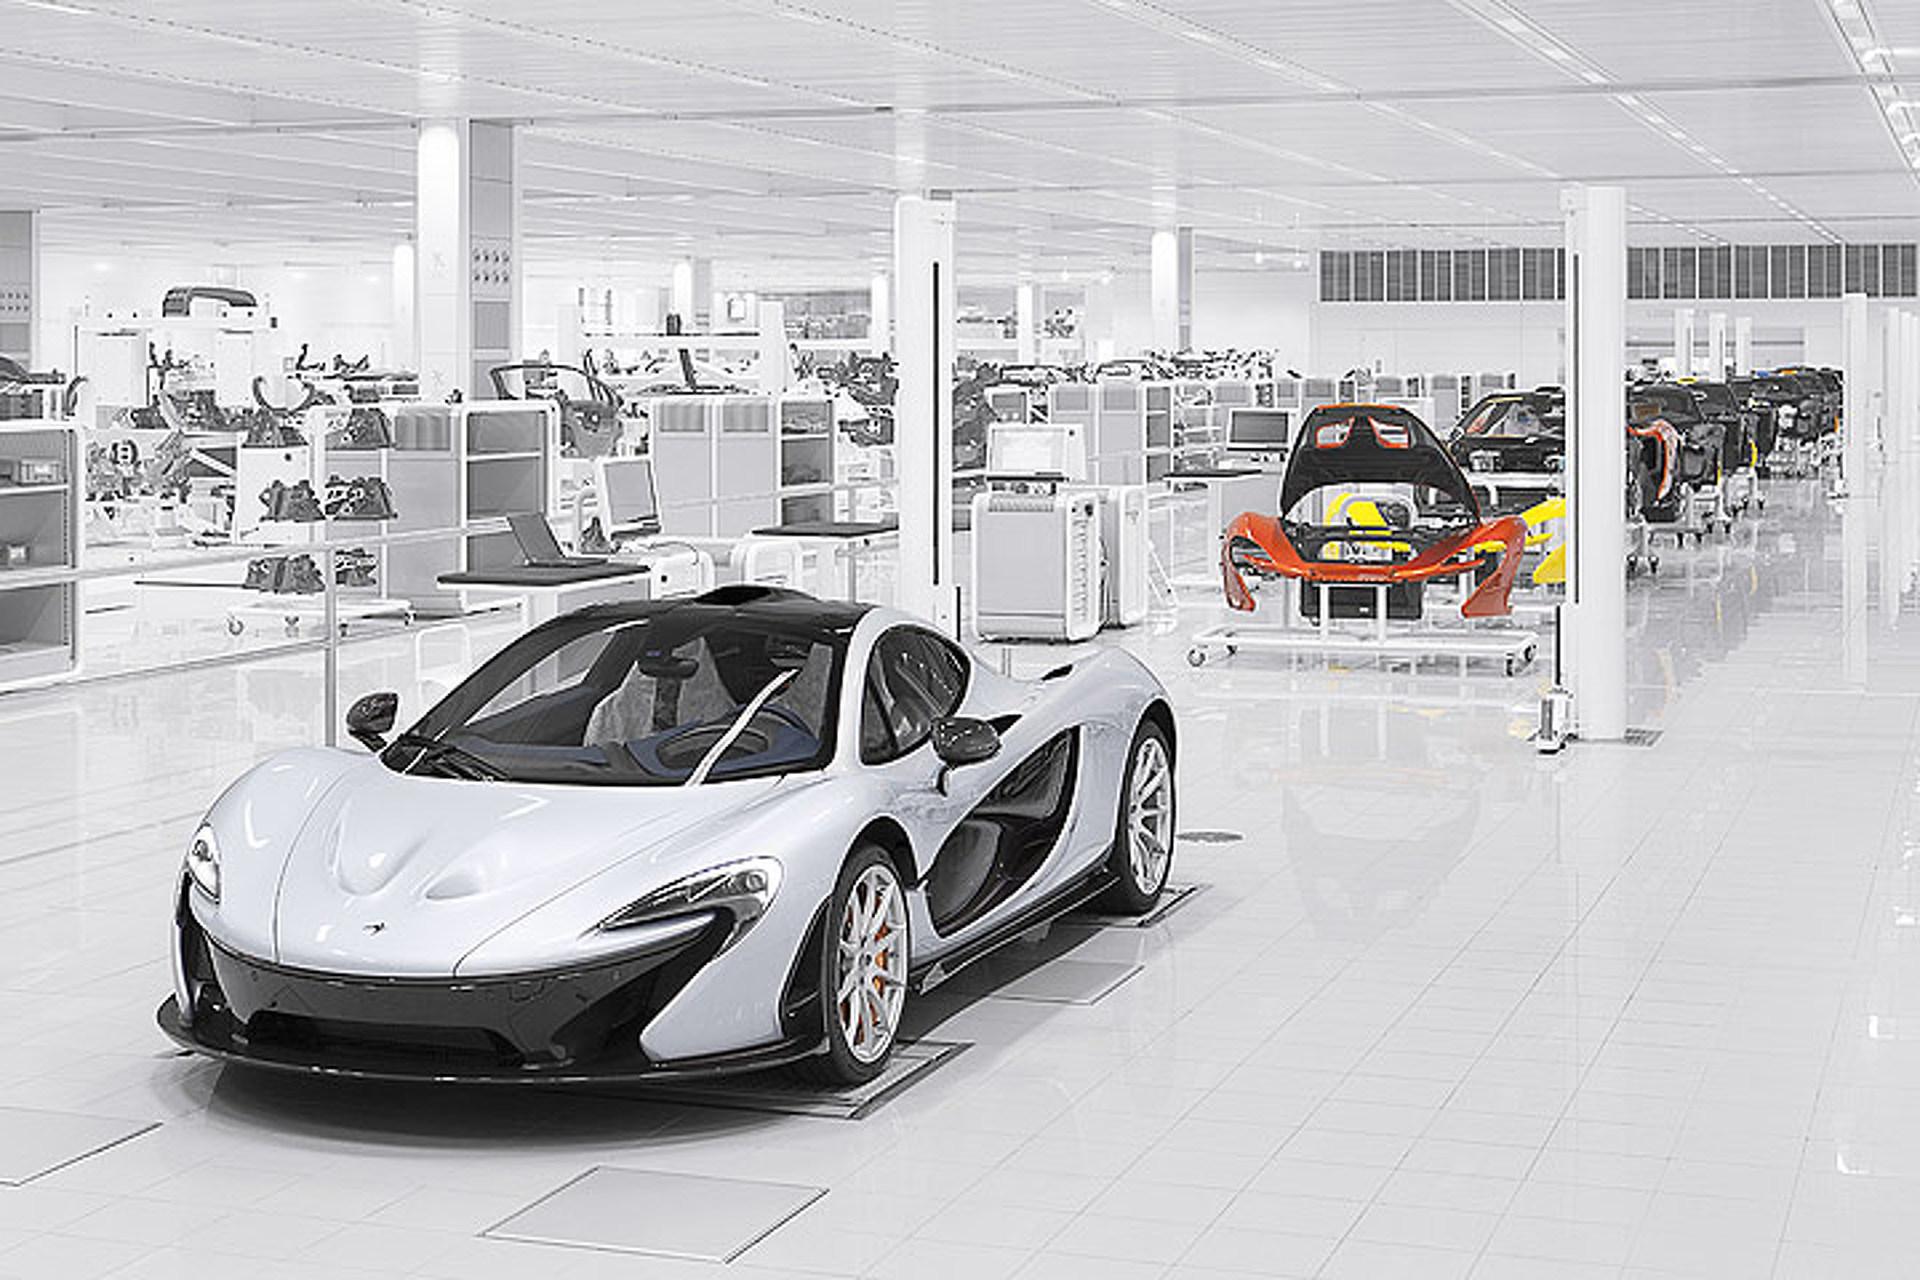 McLaren is Preparing to Build a New Hypercar